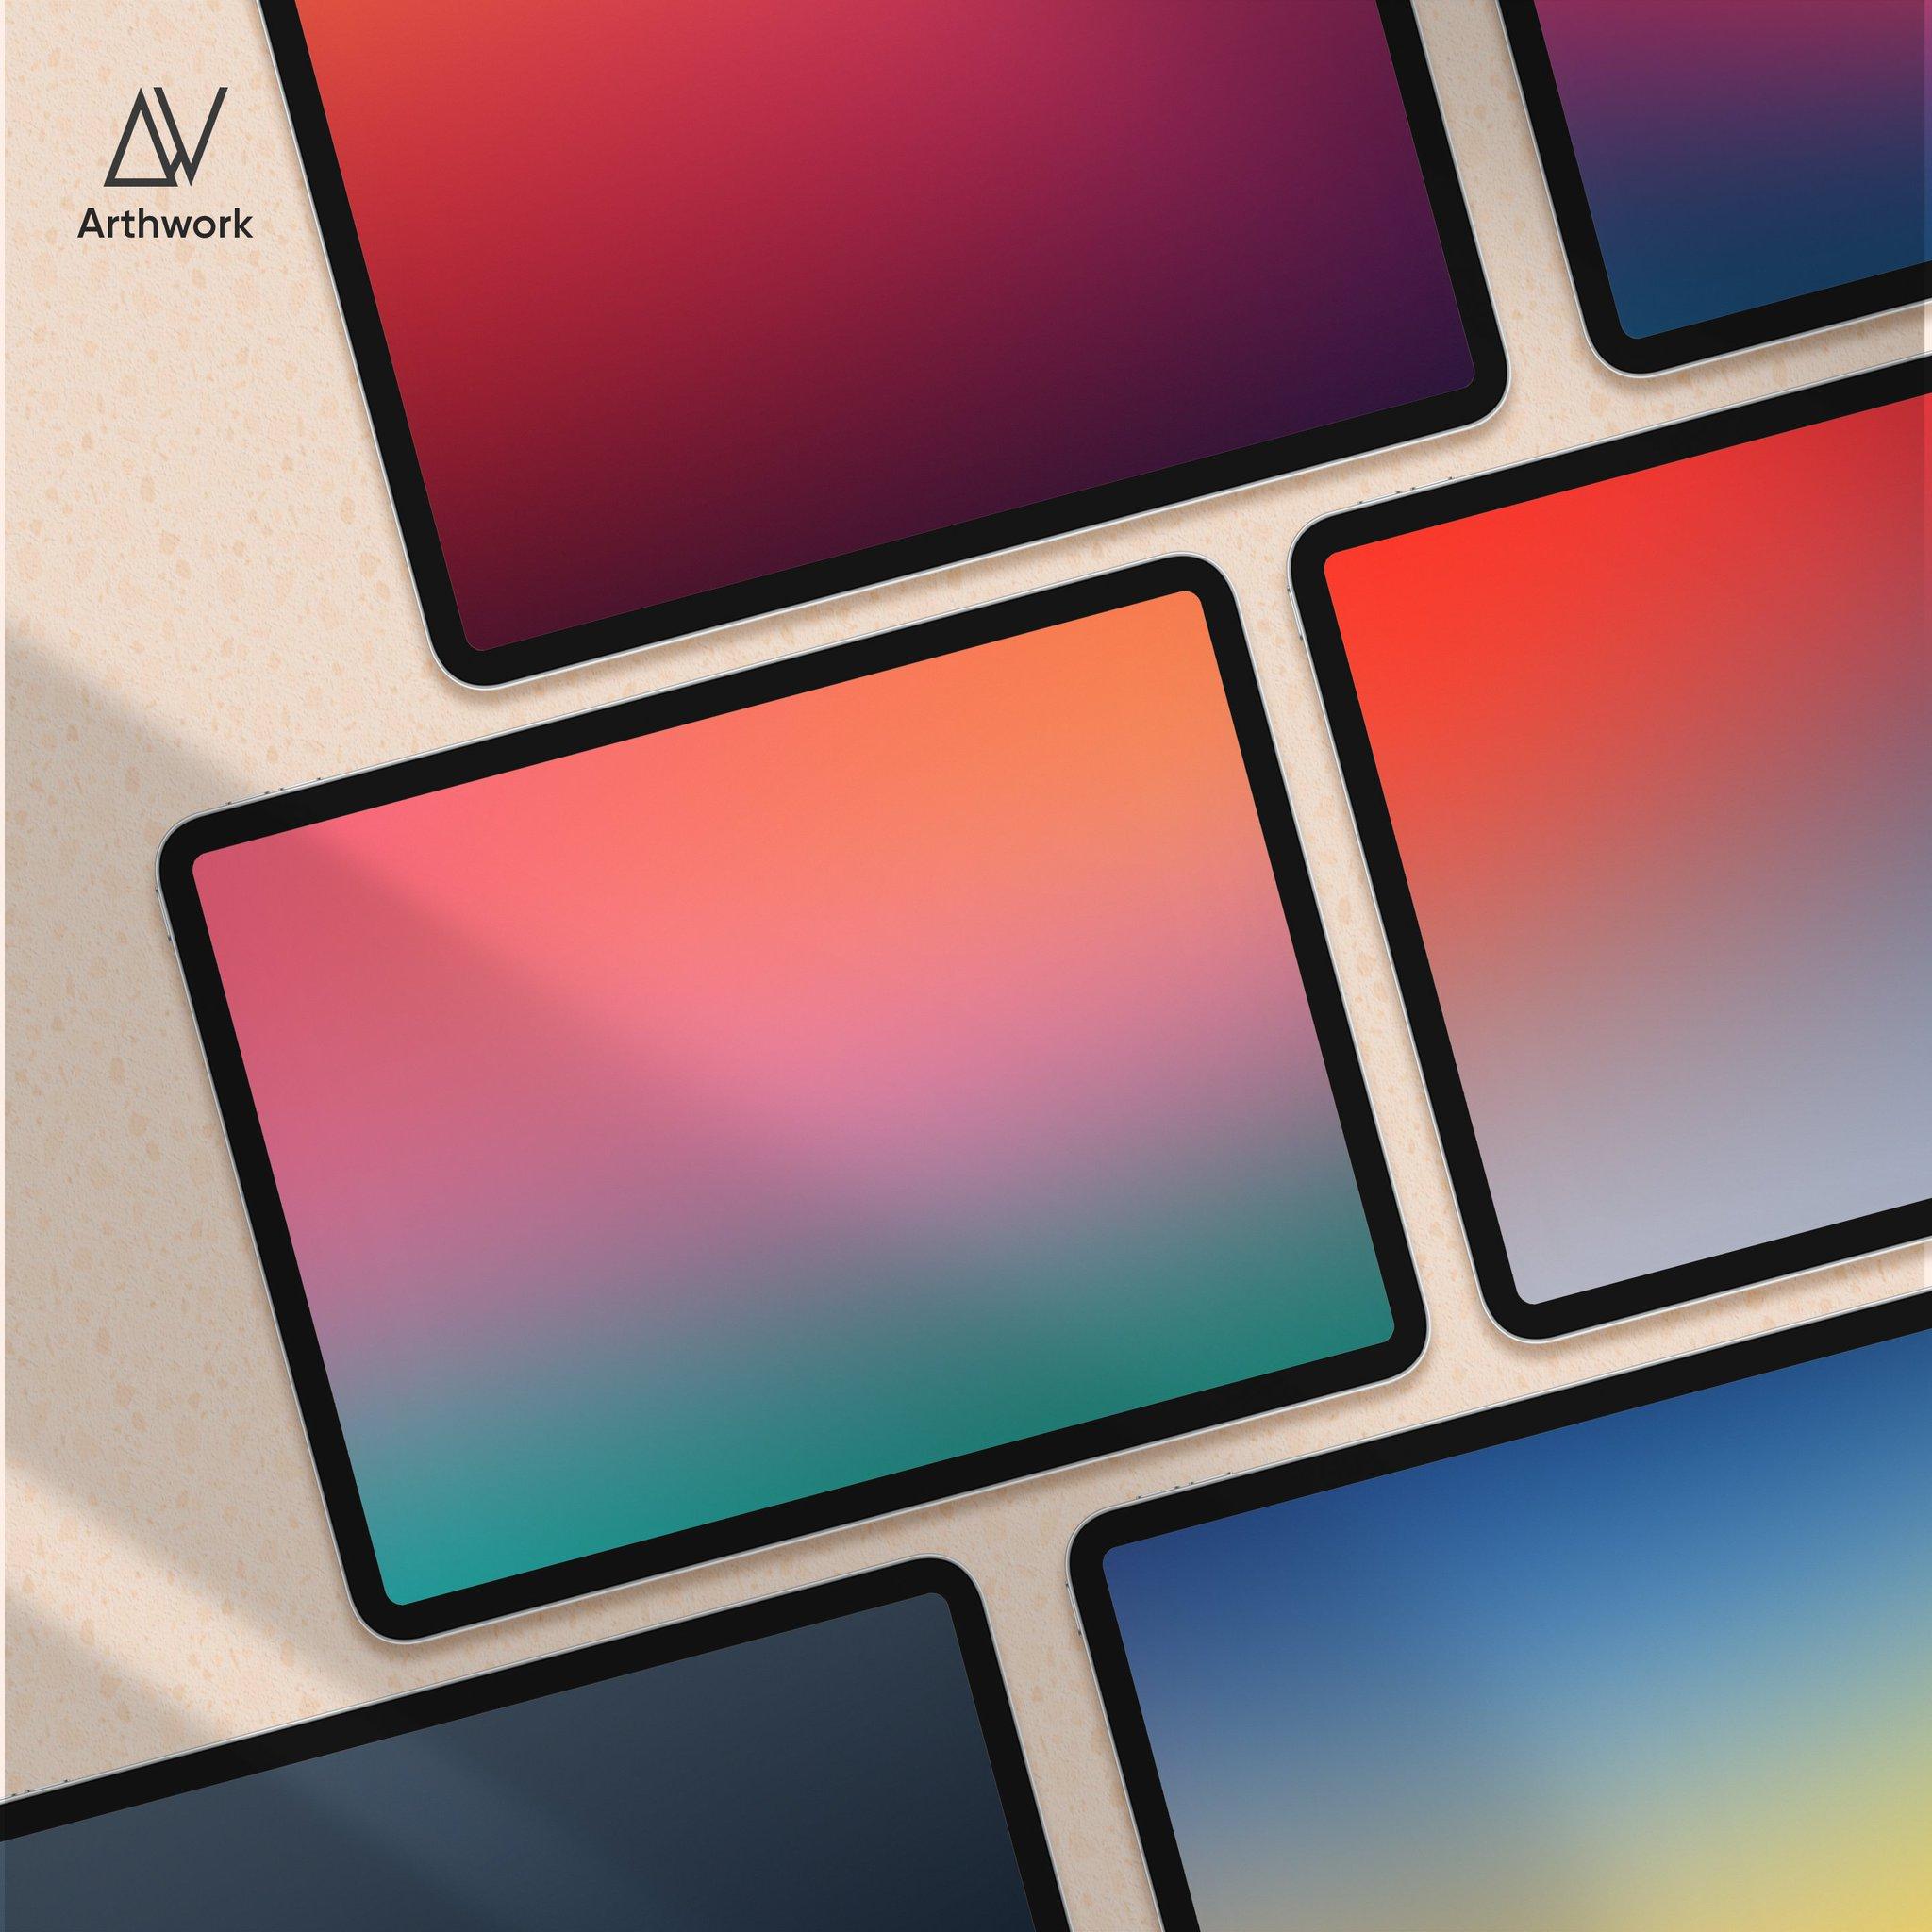 Gradient iPad wallpaper pack